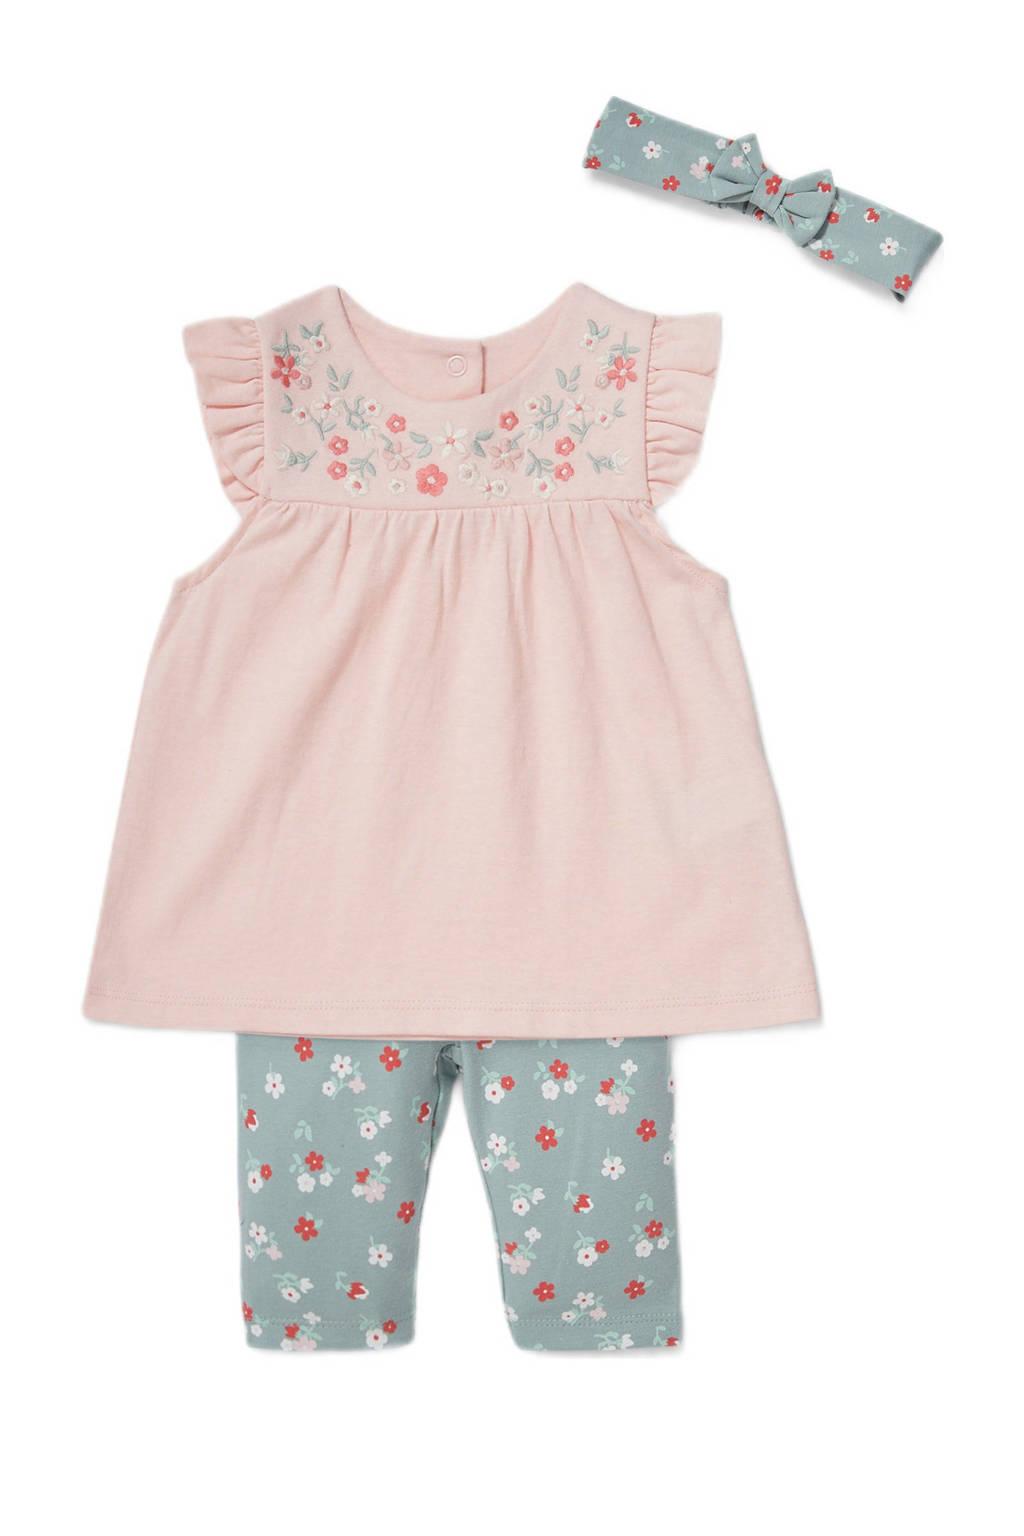 C&A Baby Club tuniek + legging + haarband zachtroze/groen, Roze